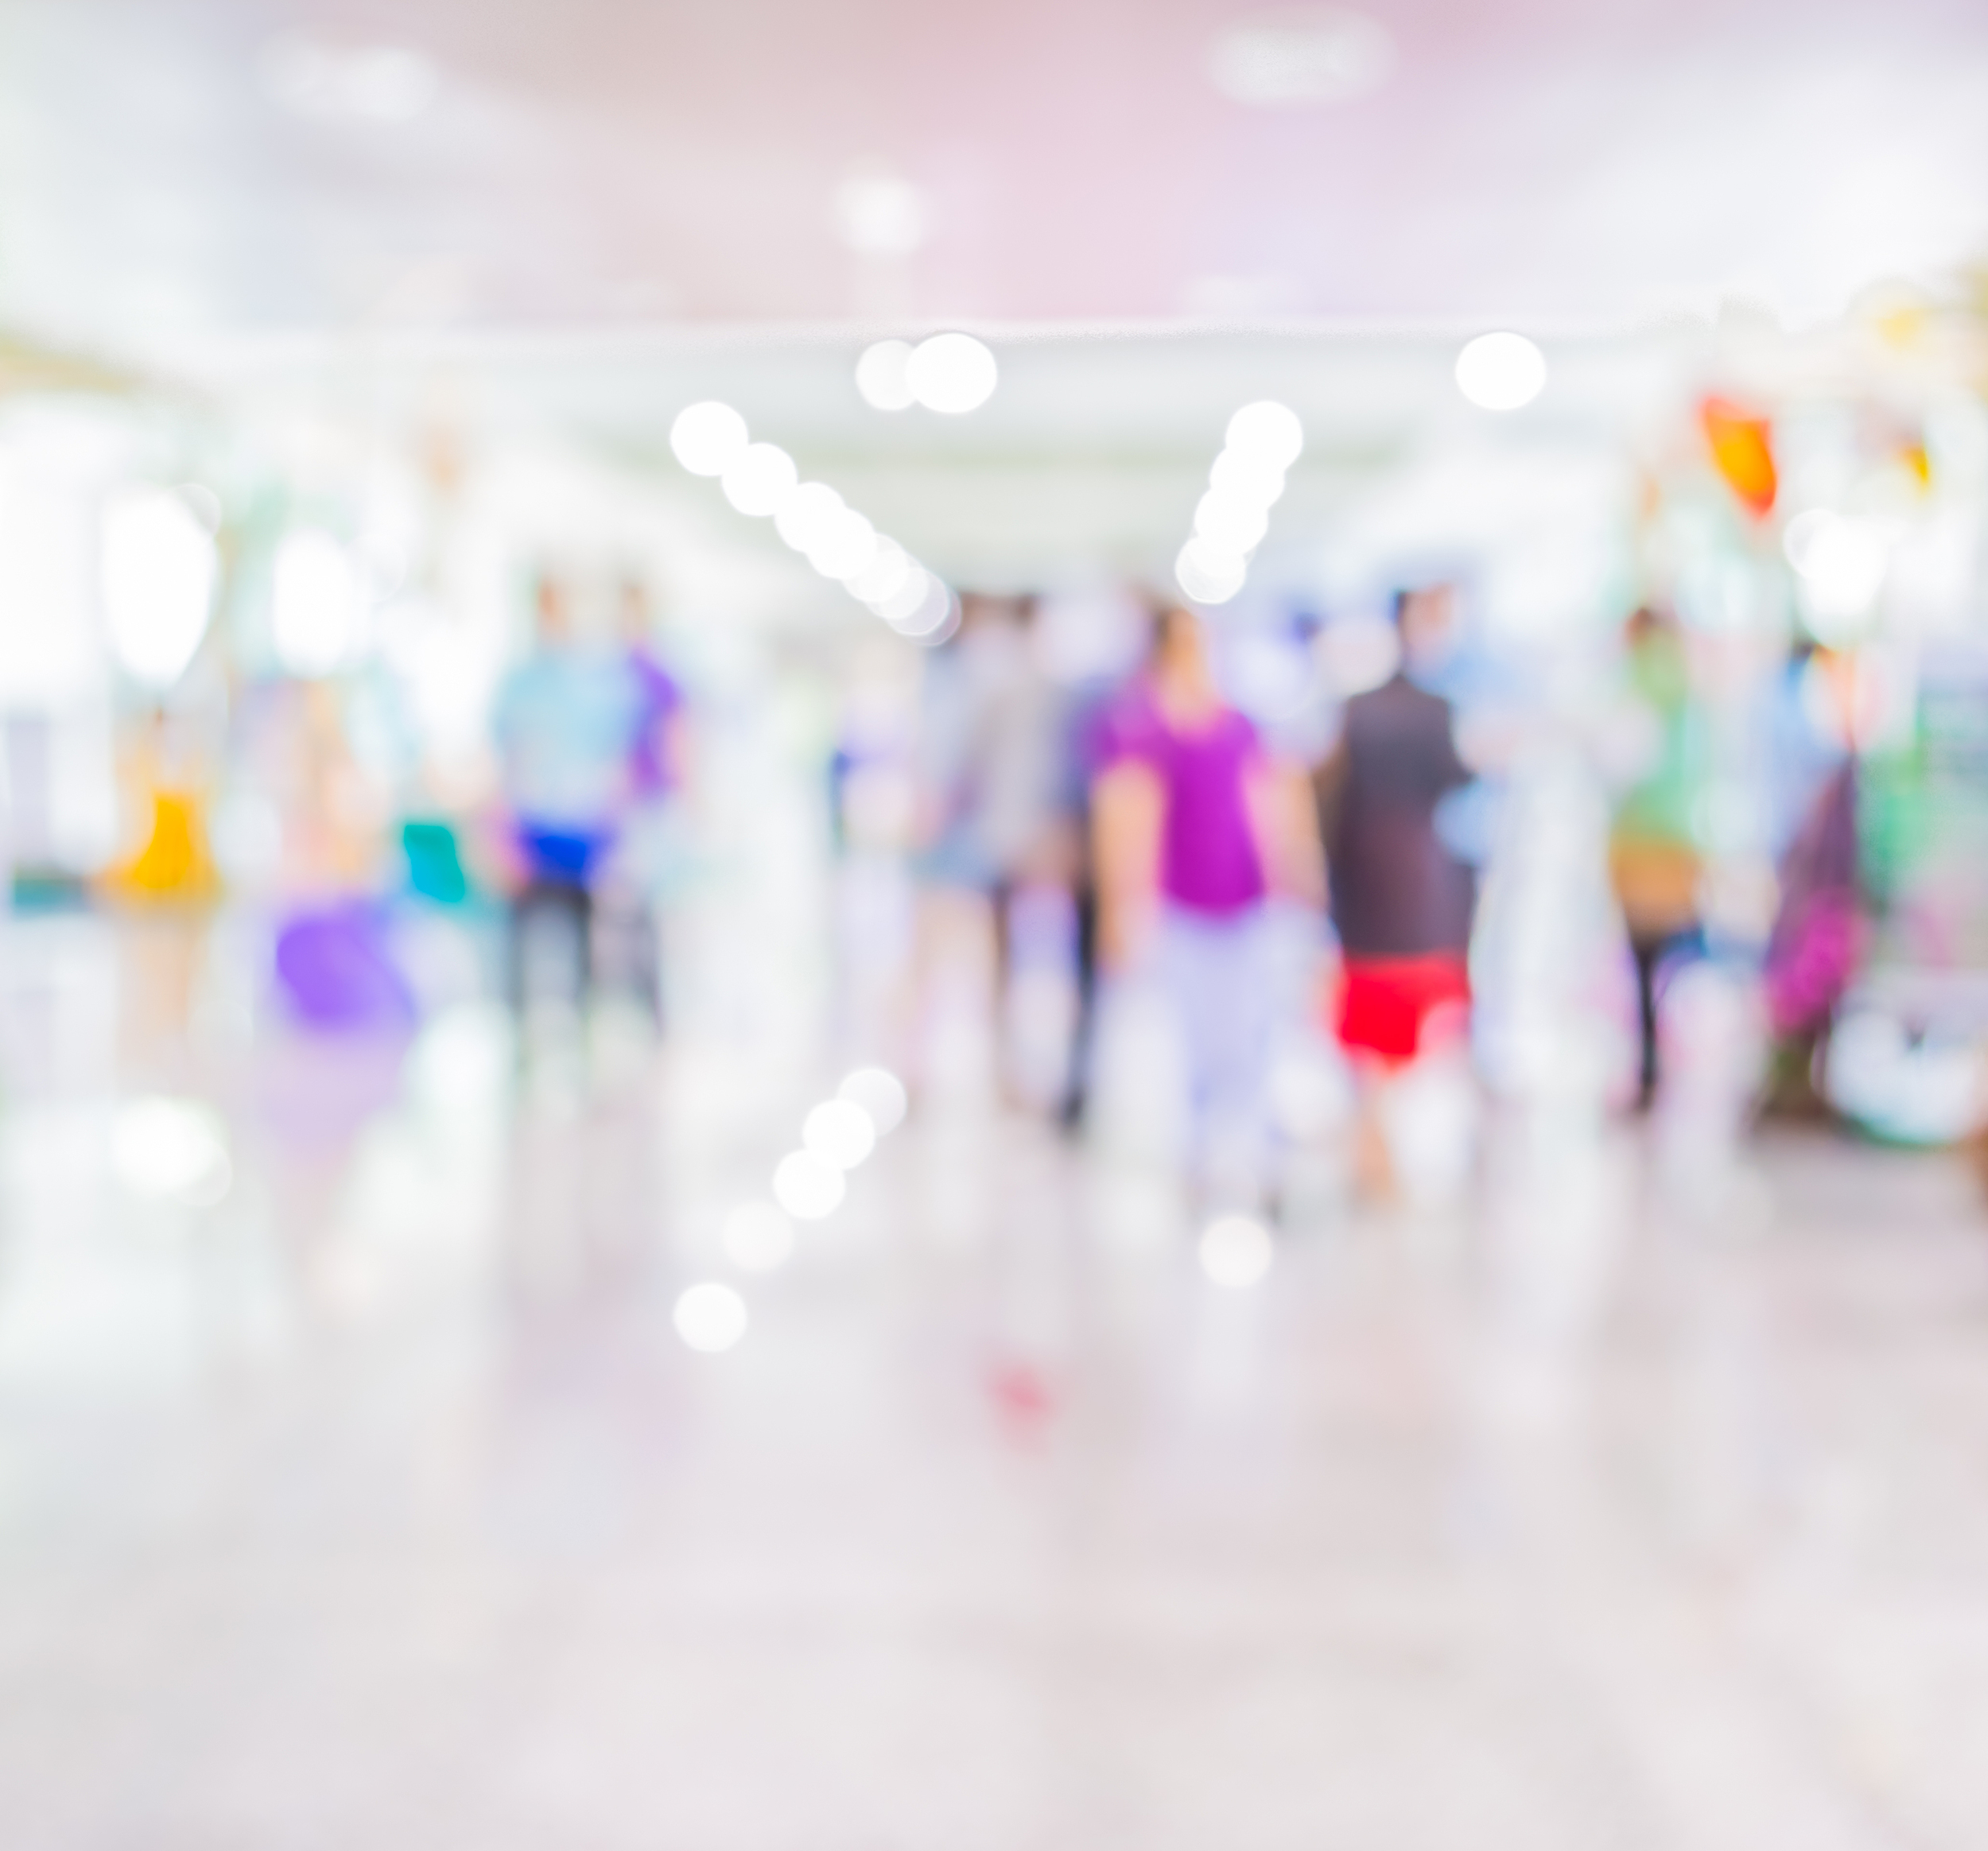 bigstock-Blurred-Image-Of-People-Walkin-95196449.jpg